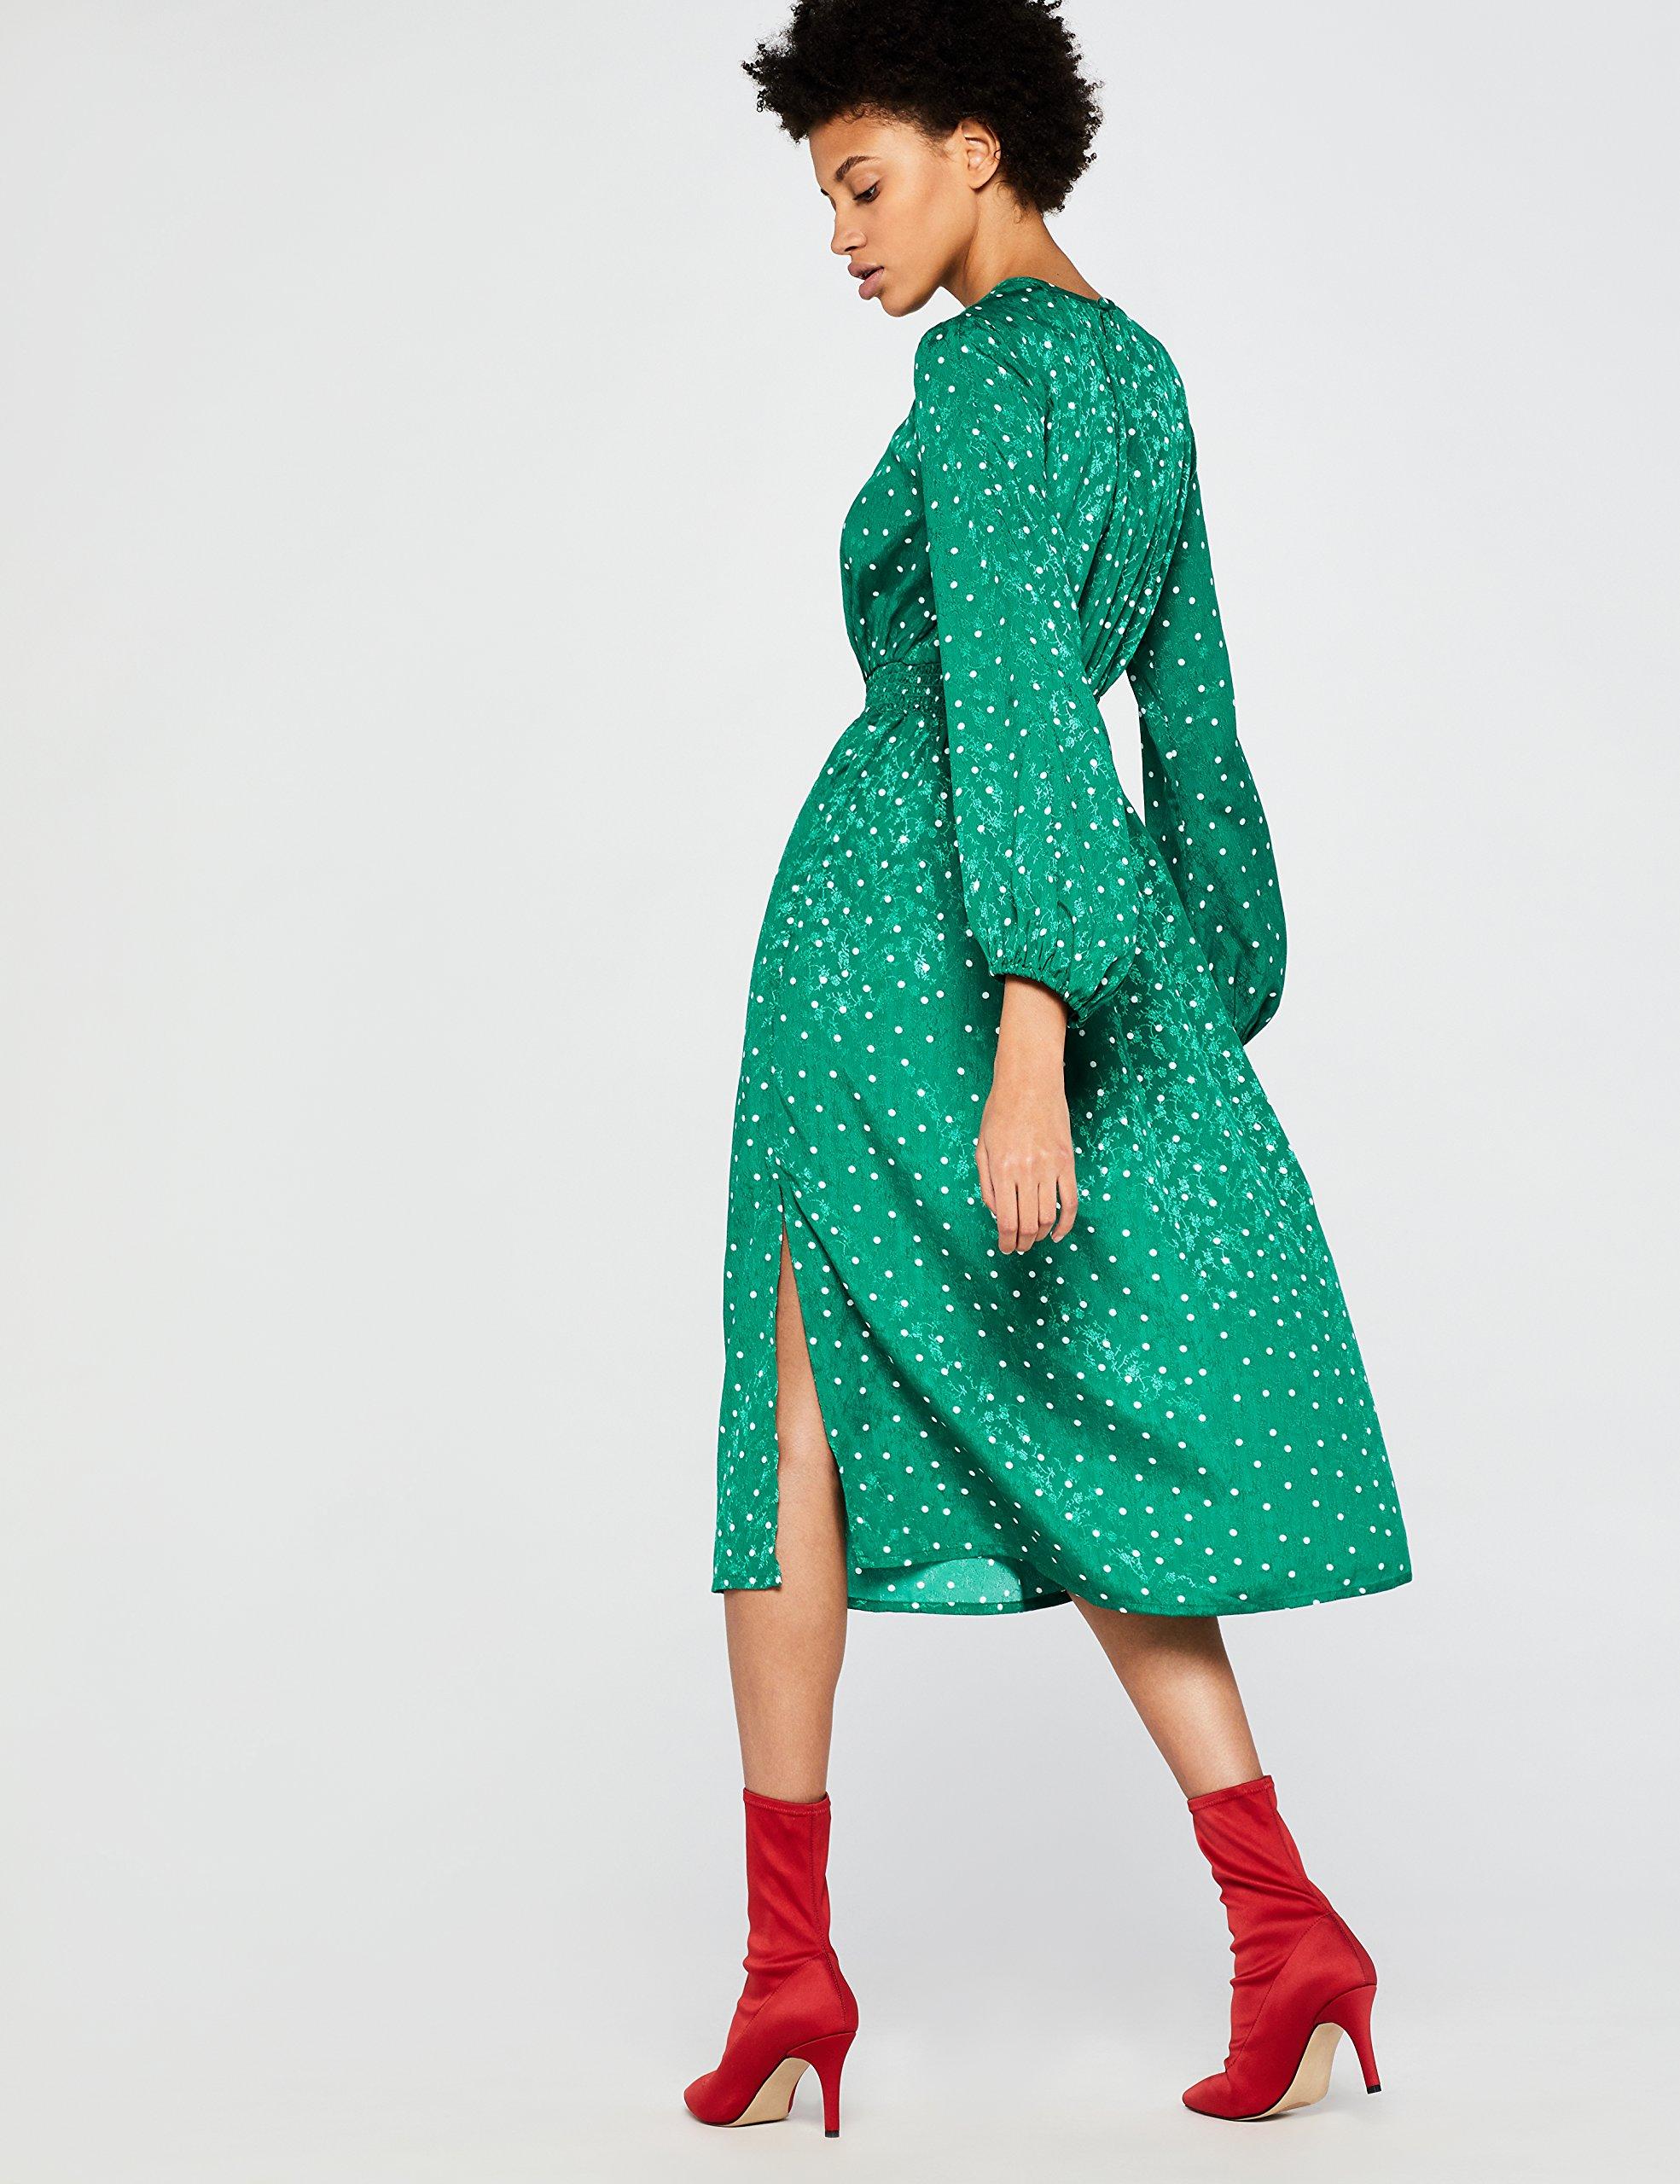 find. dress